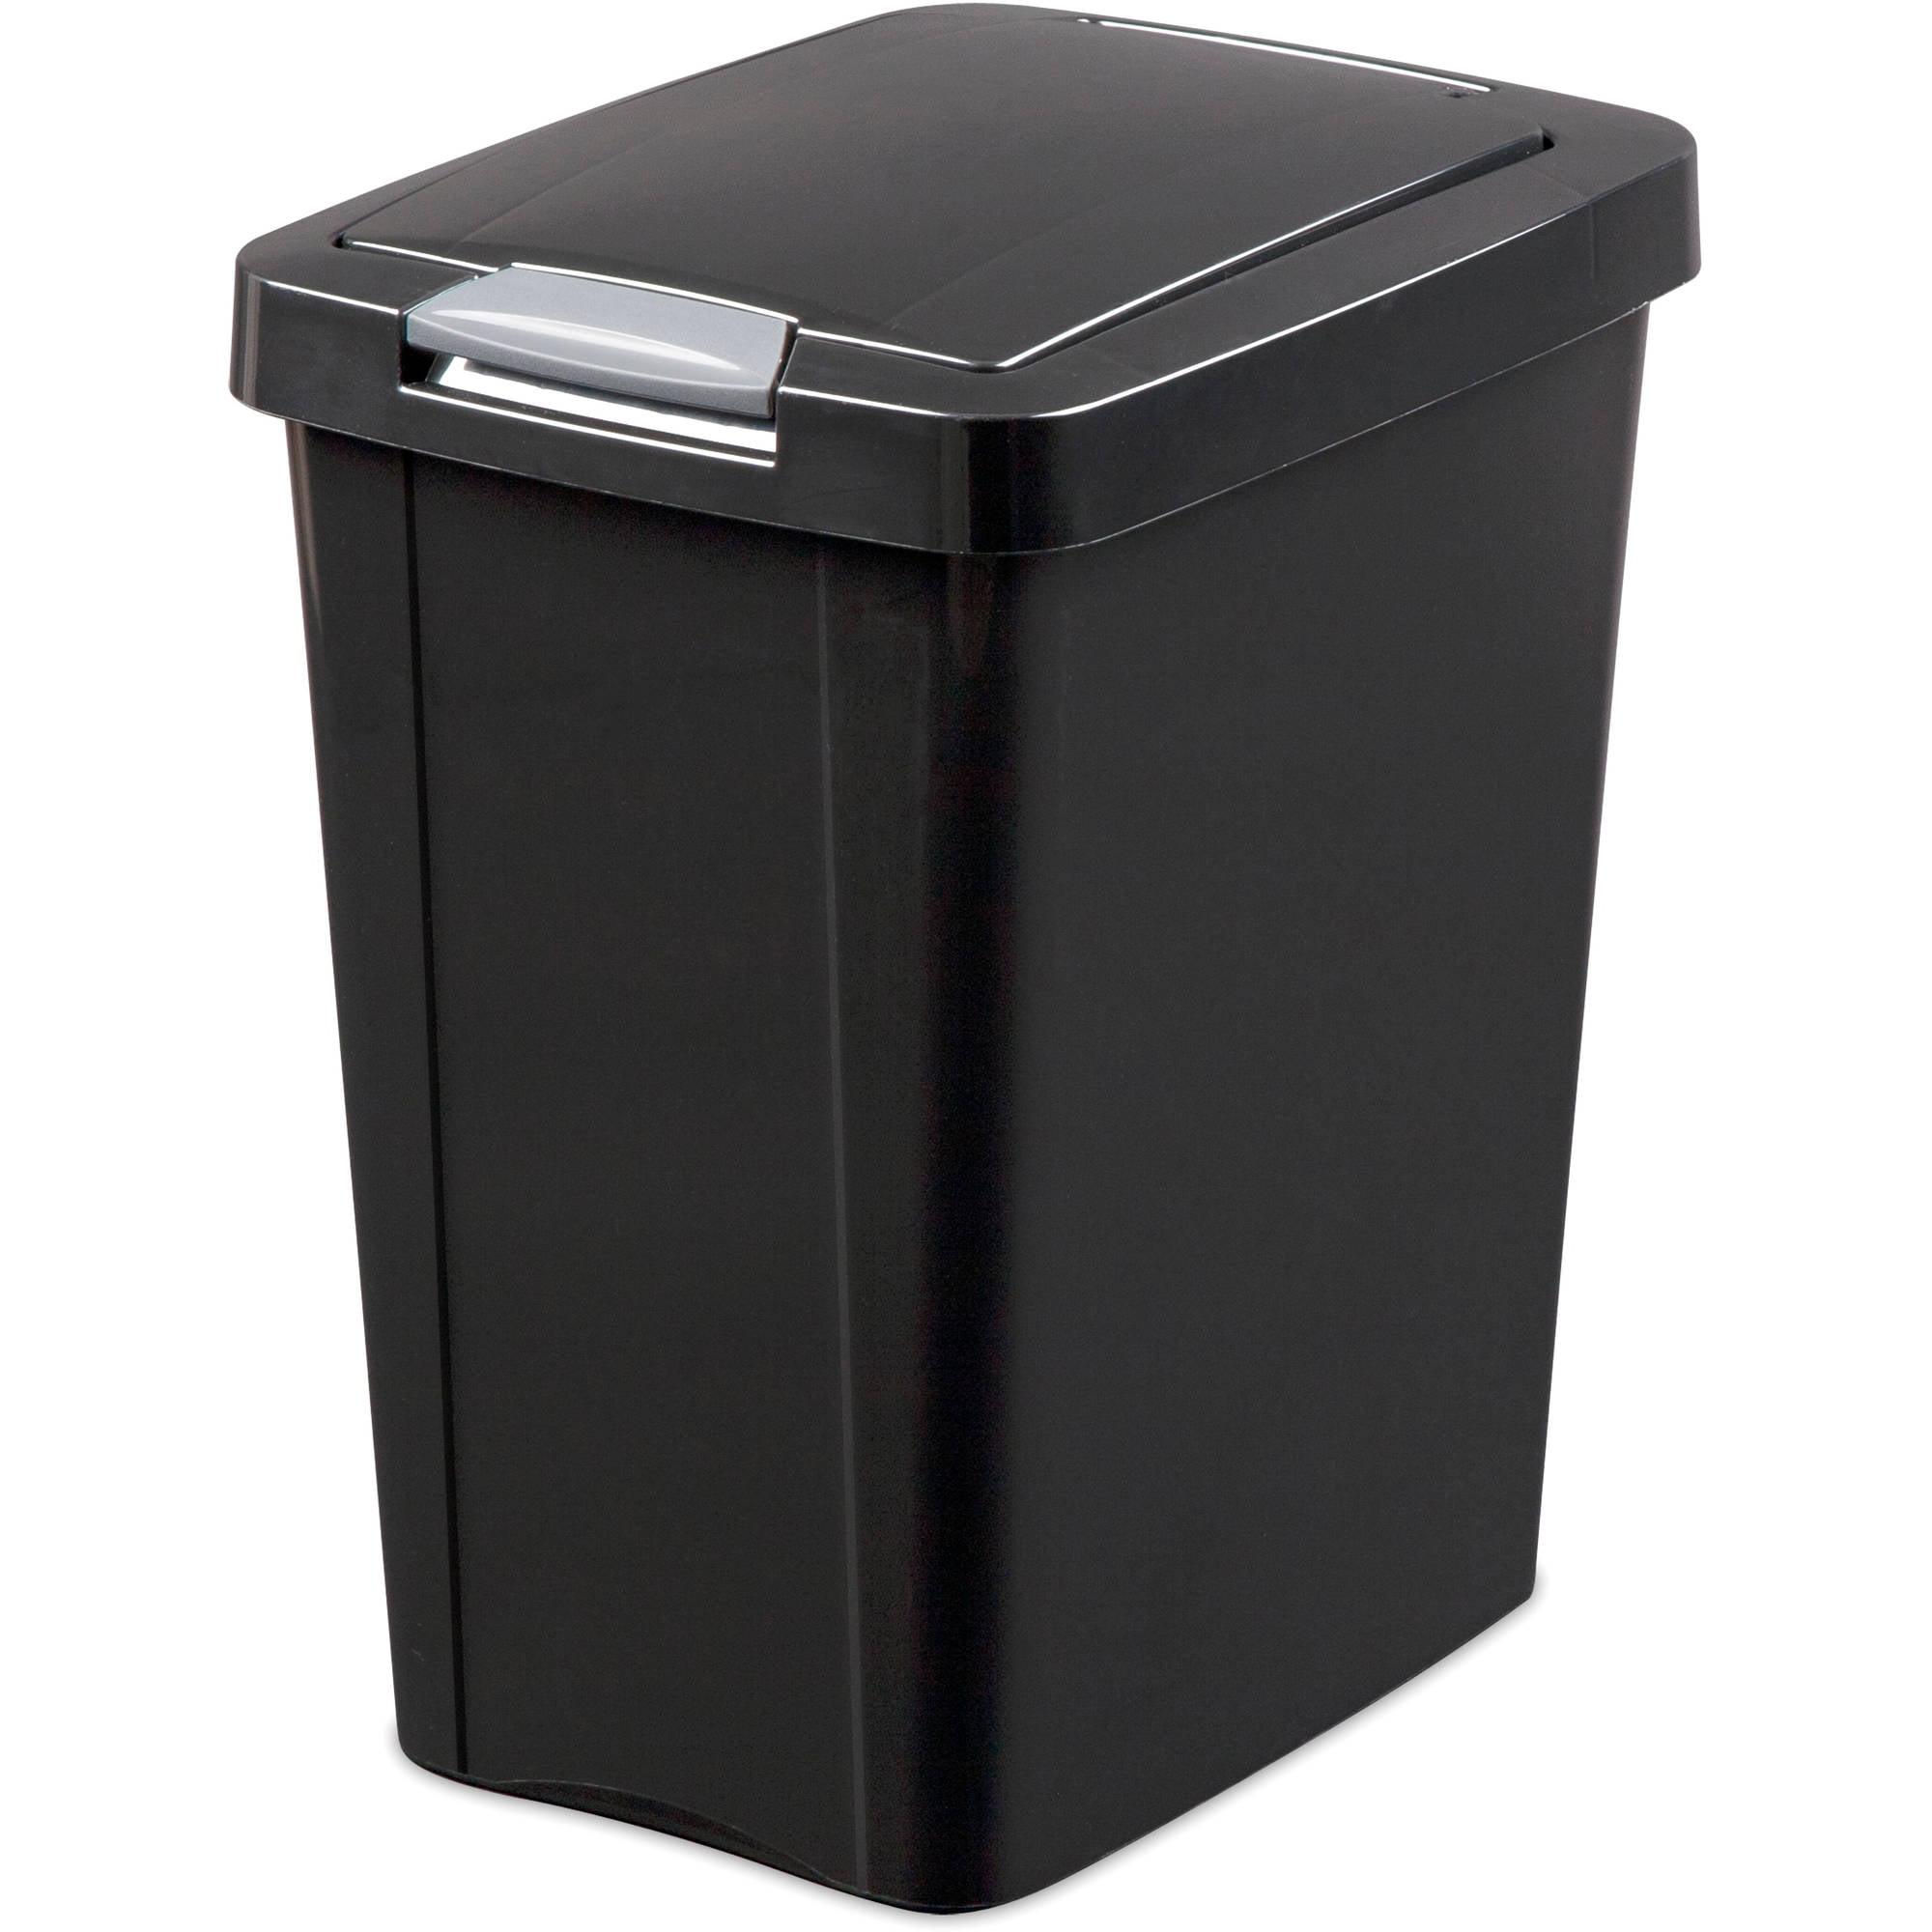 Ordinary Office Waste Basket Sterilite 7.5 Gallon Touch Top Wastebasket,  Black Walmart.com